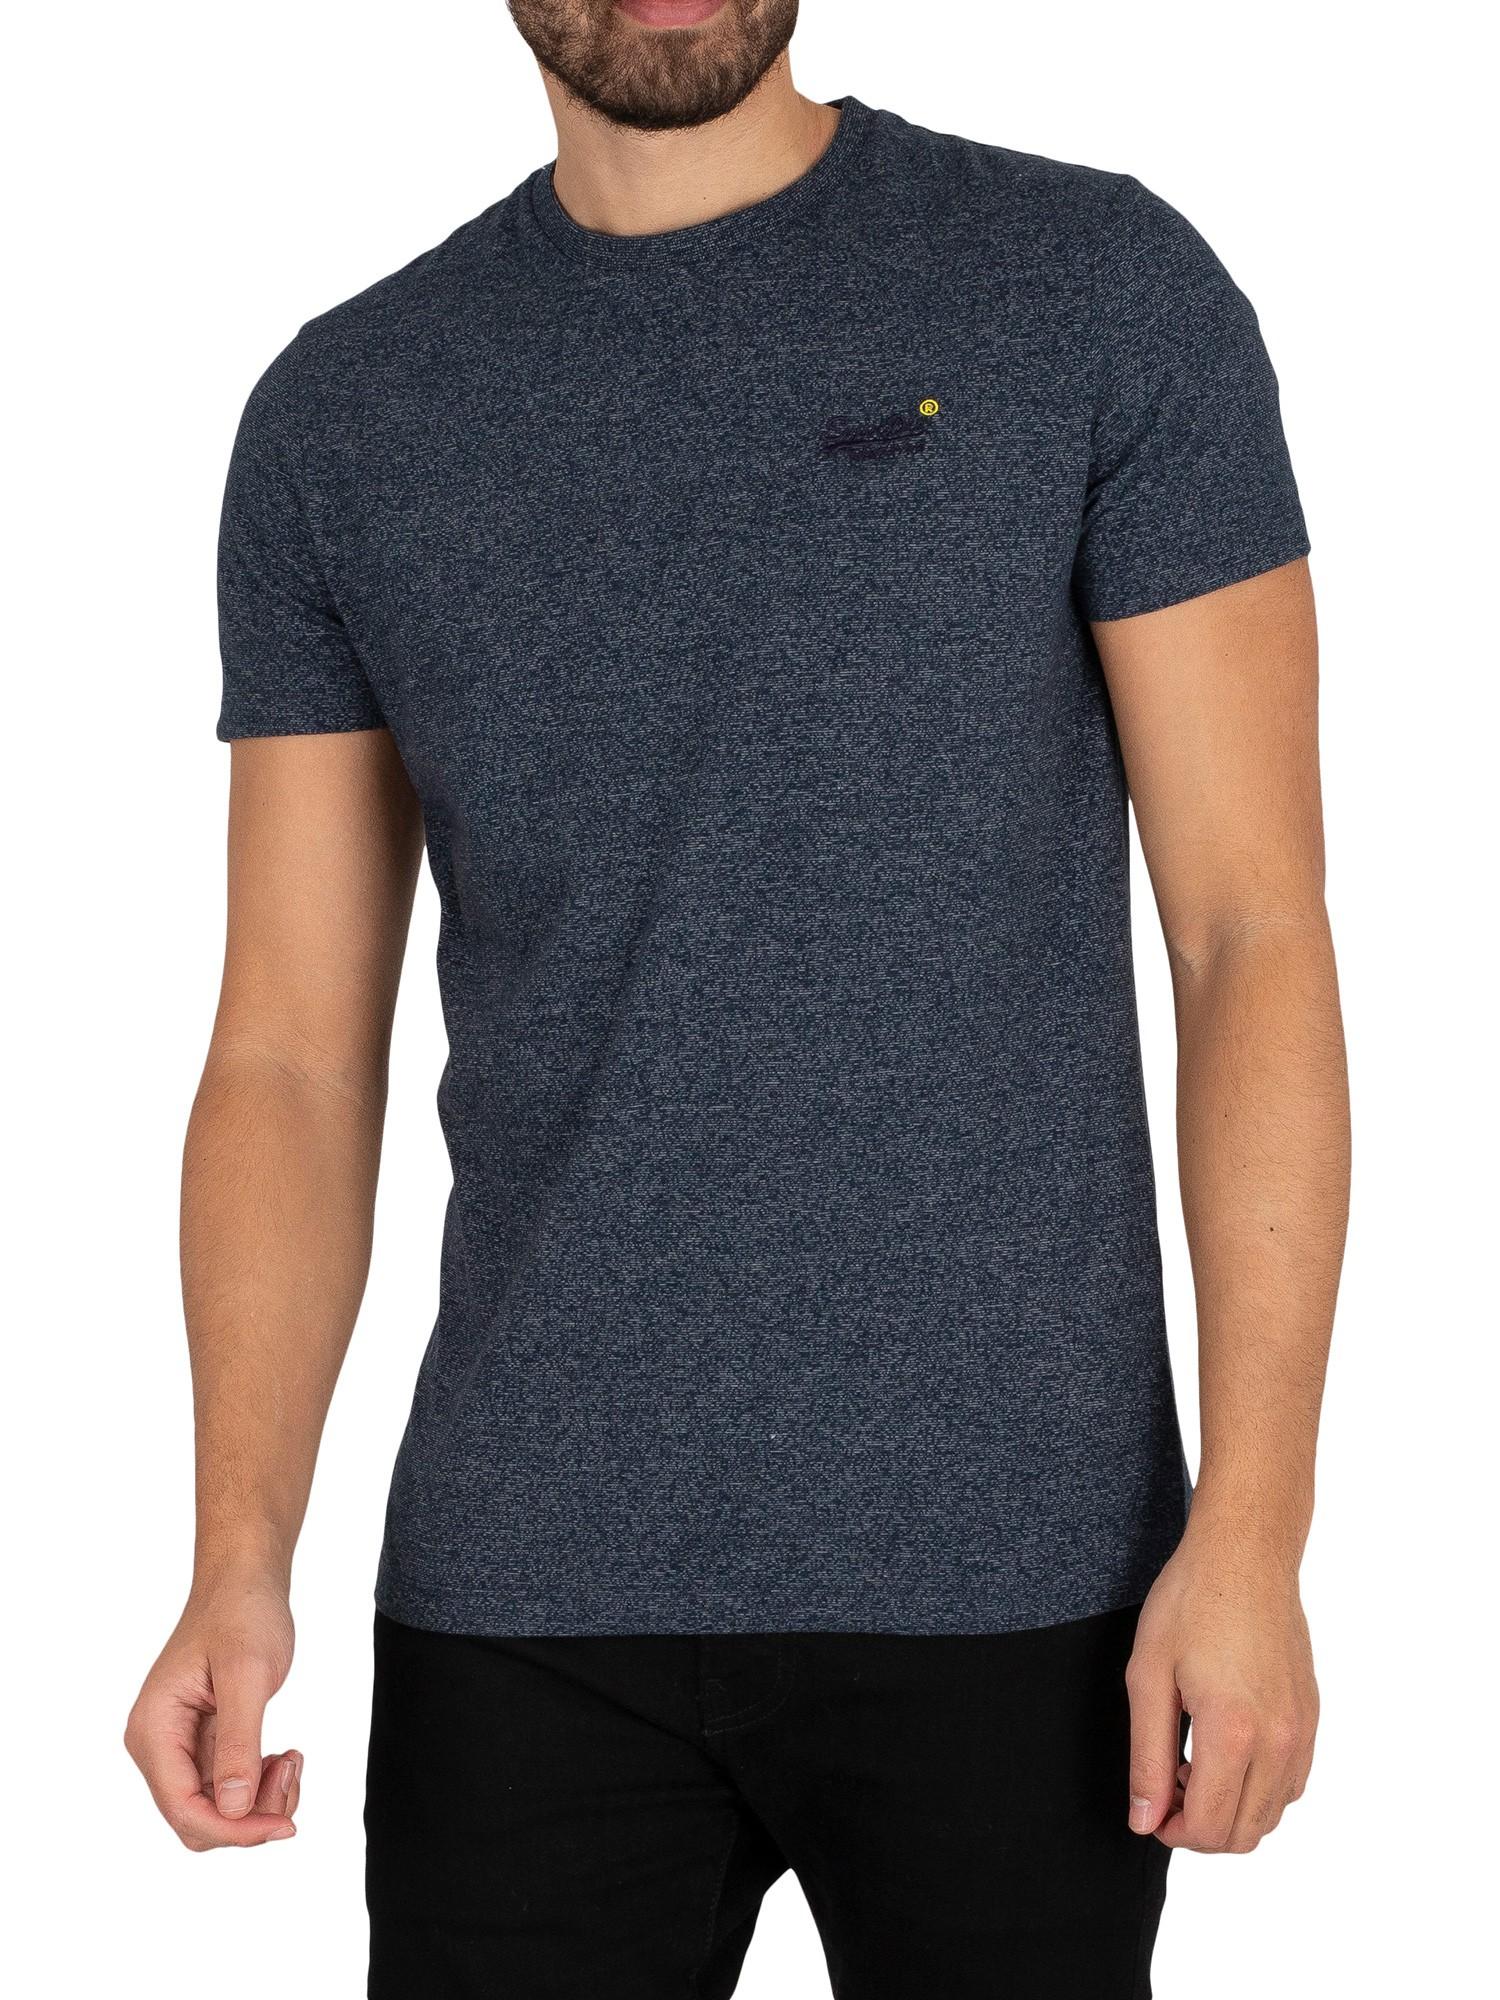 Original-Logo-Vintage-Embroidered-TShirt